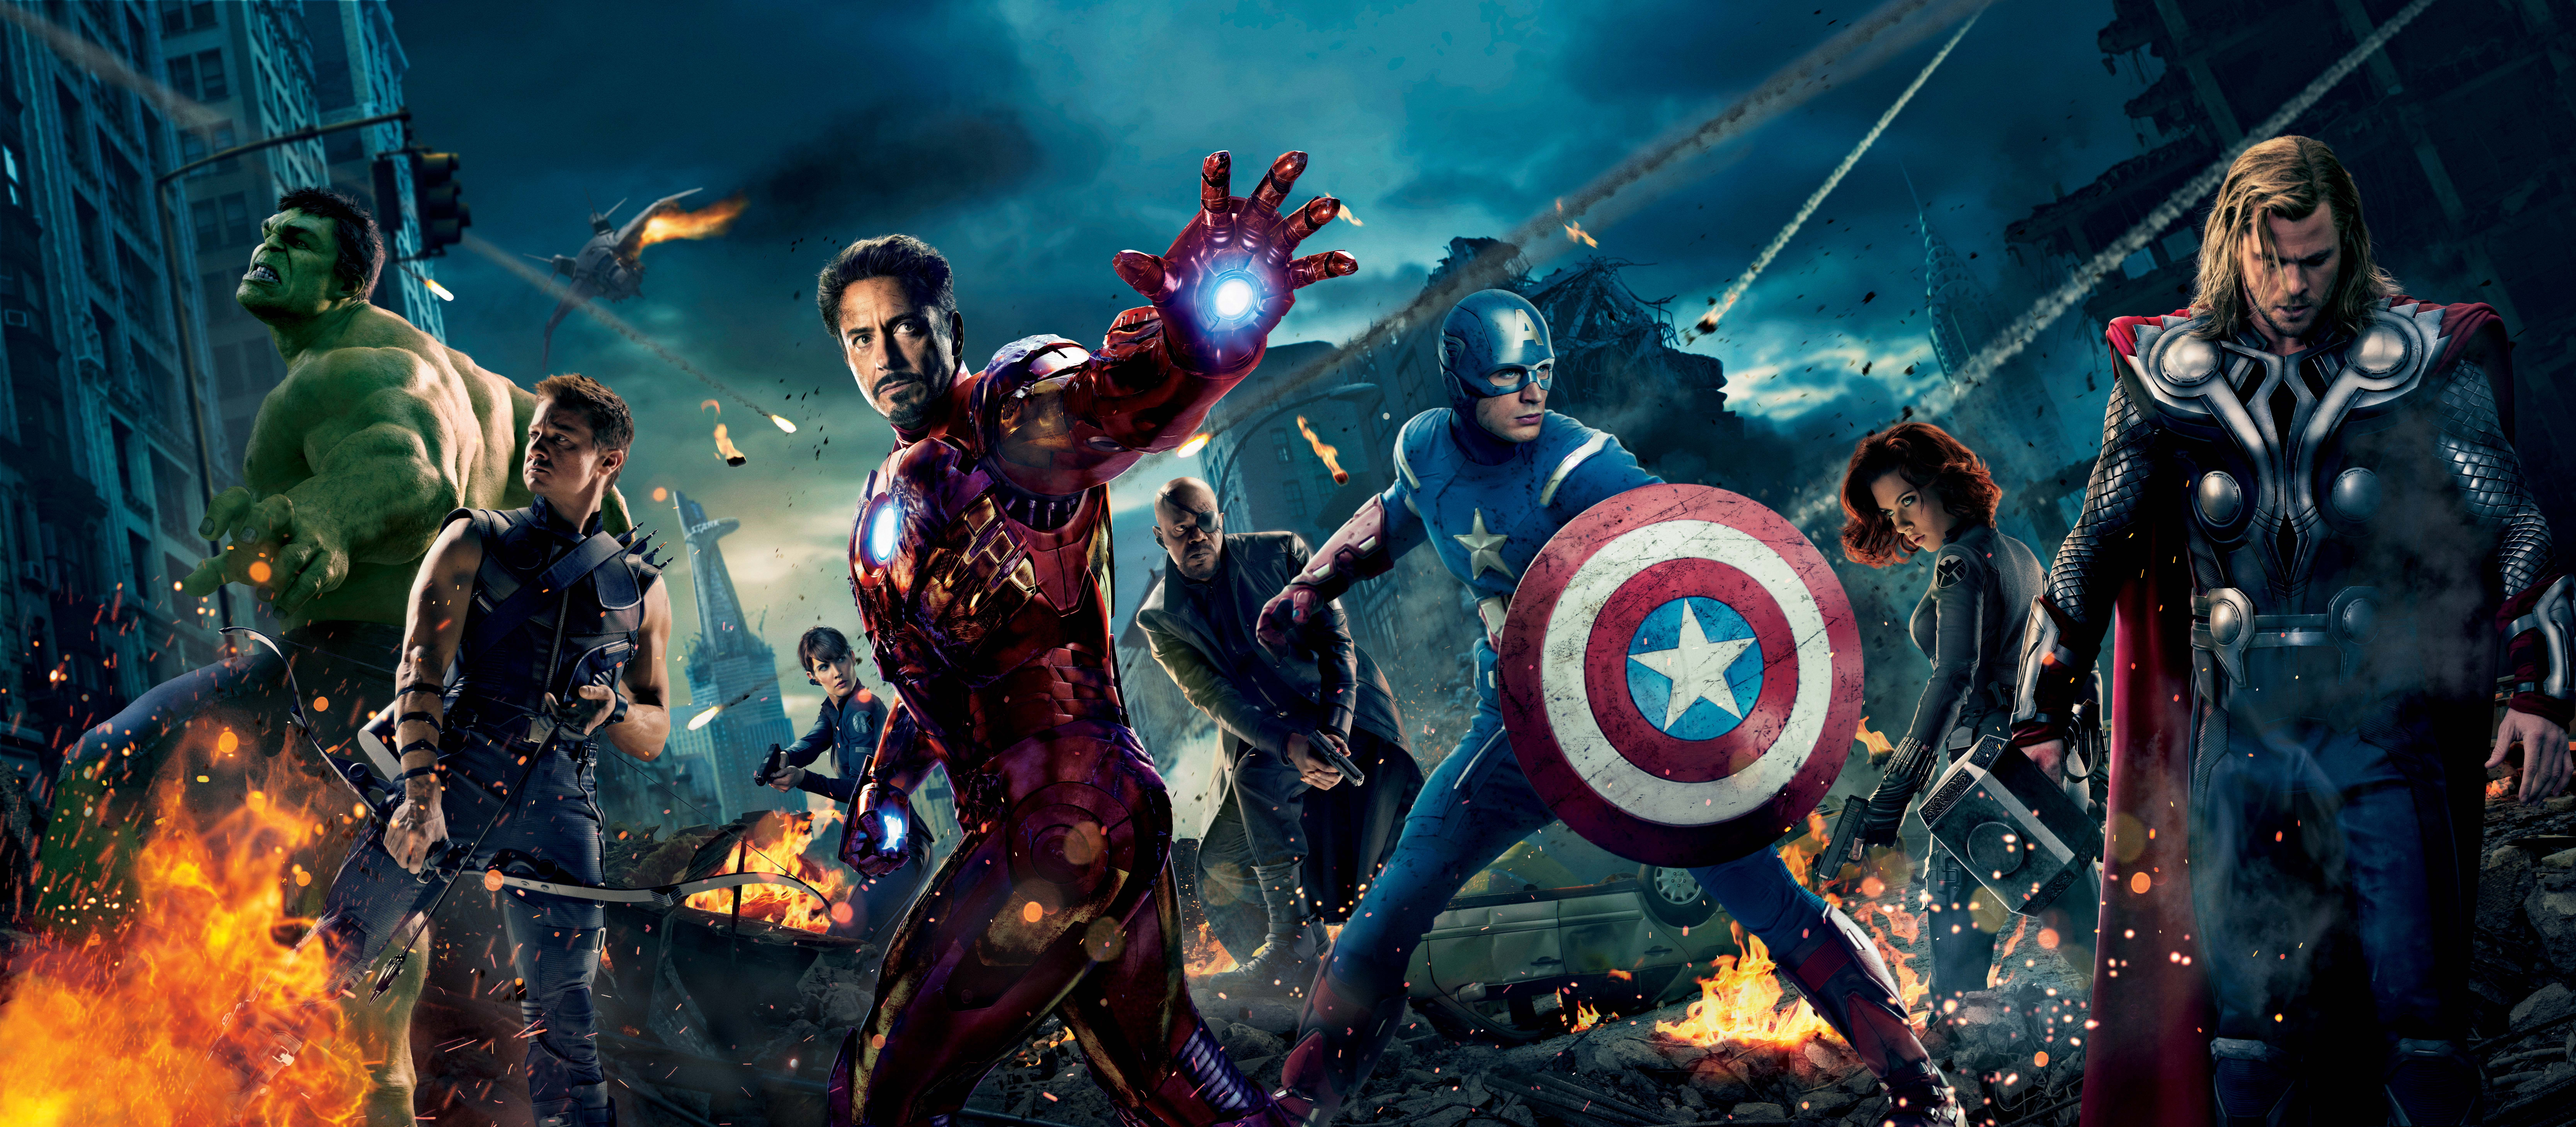 General 13333x5833 The Avengers Iron Man Hulk Hawkeye Captain America Thor Nick Fury Black Widow Maria Hill Scarlett Johansson Cobie Smulders